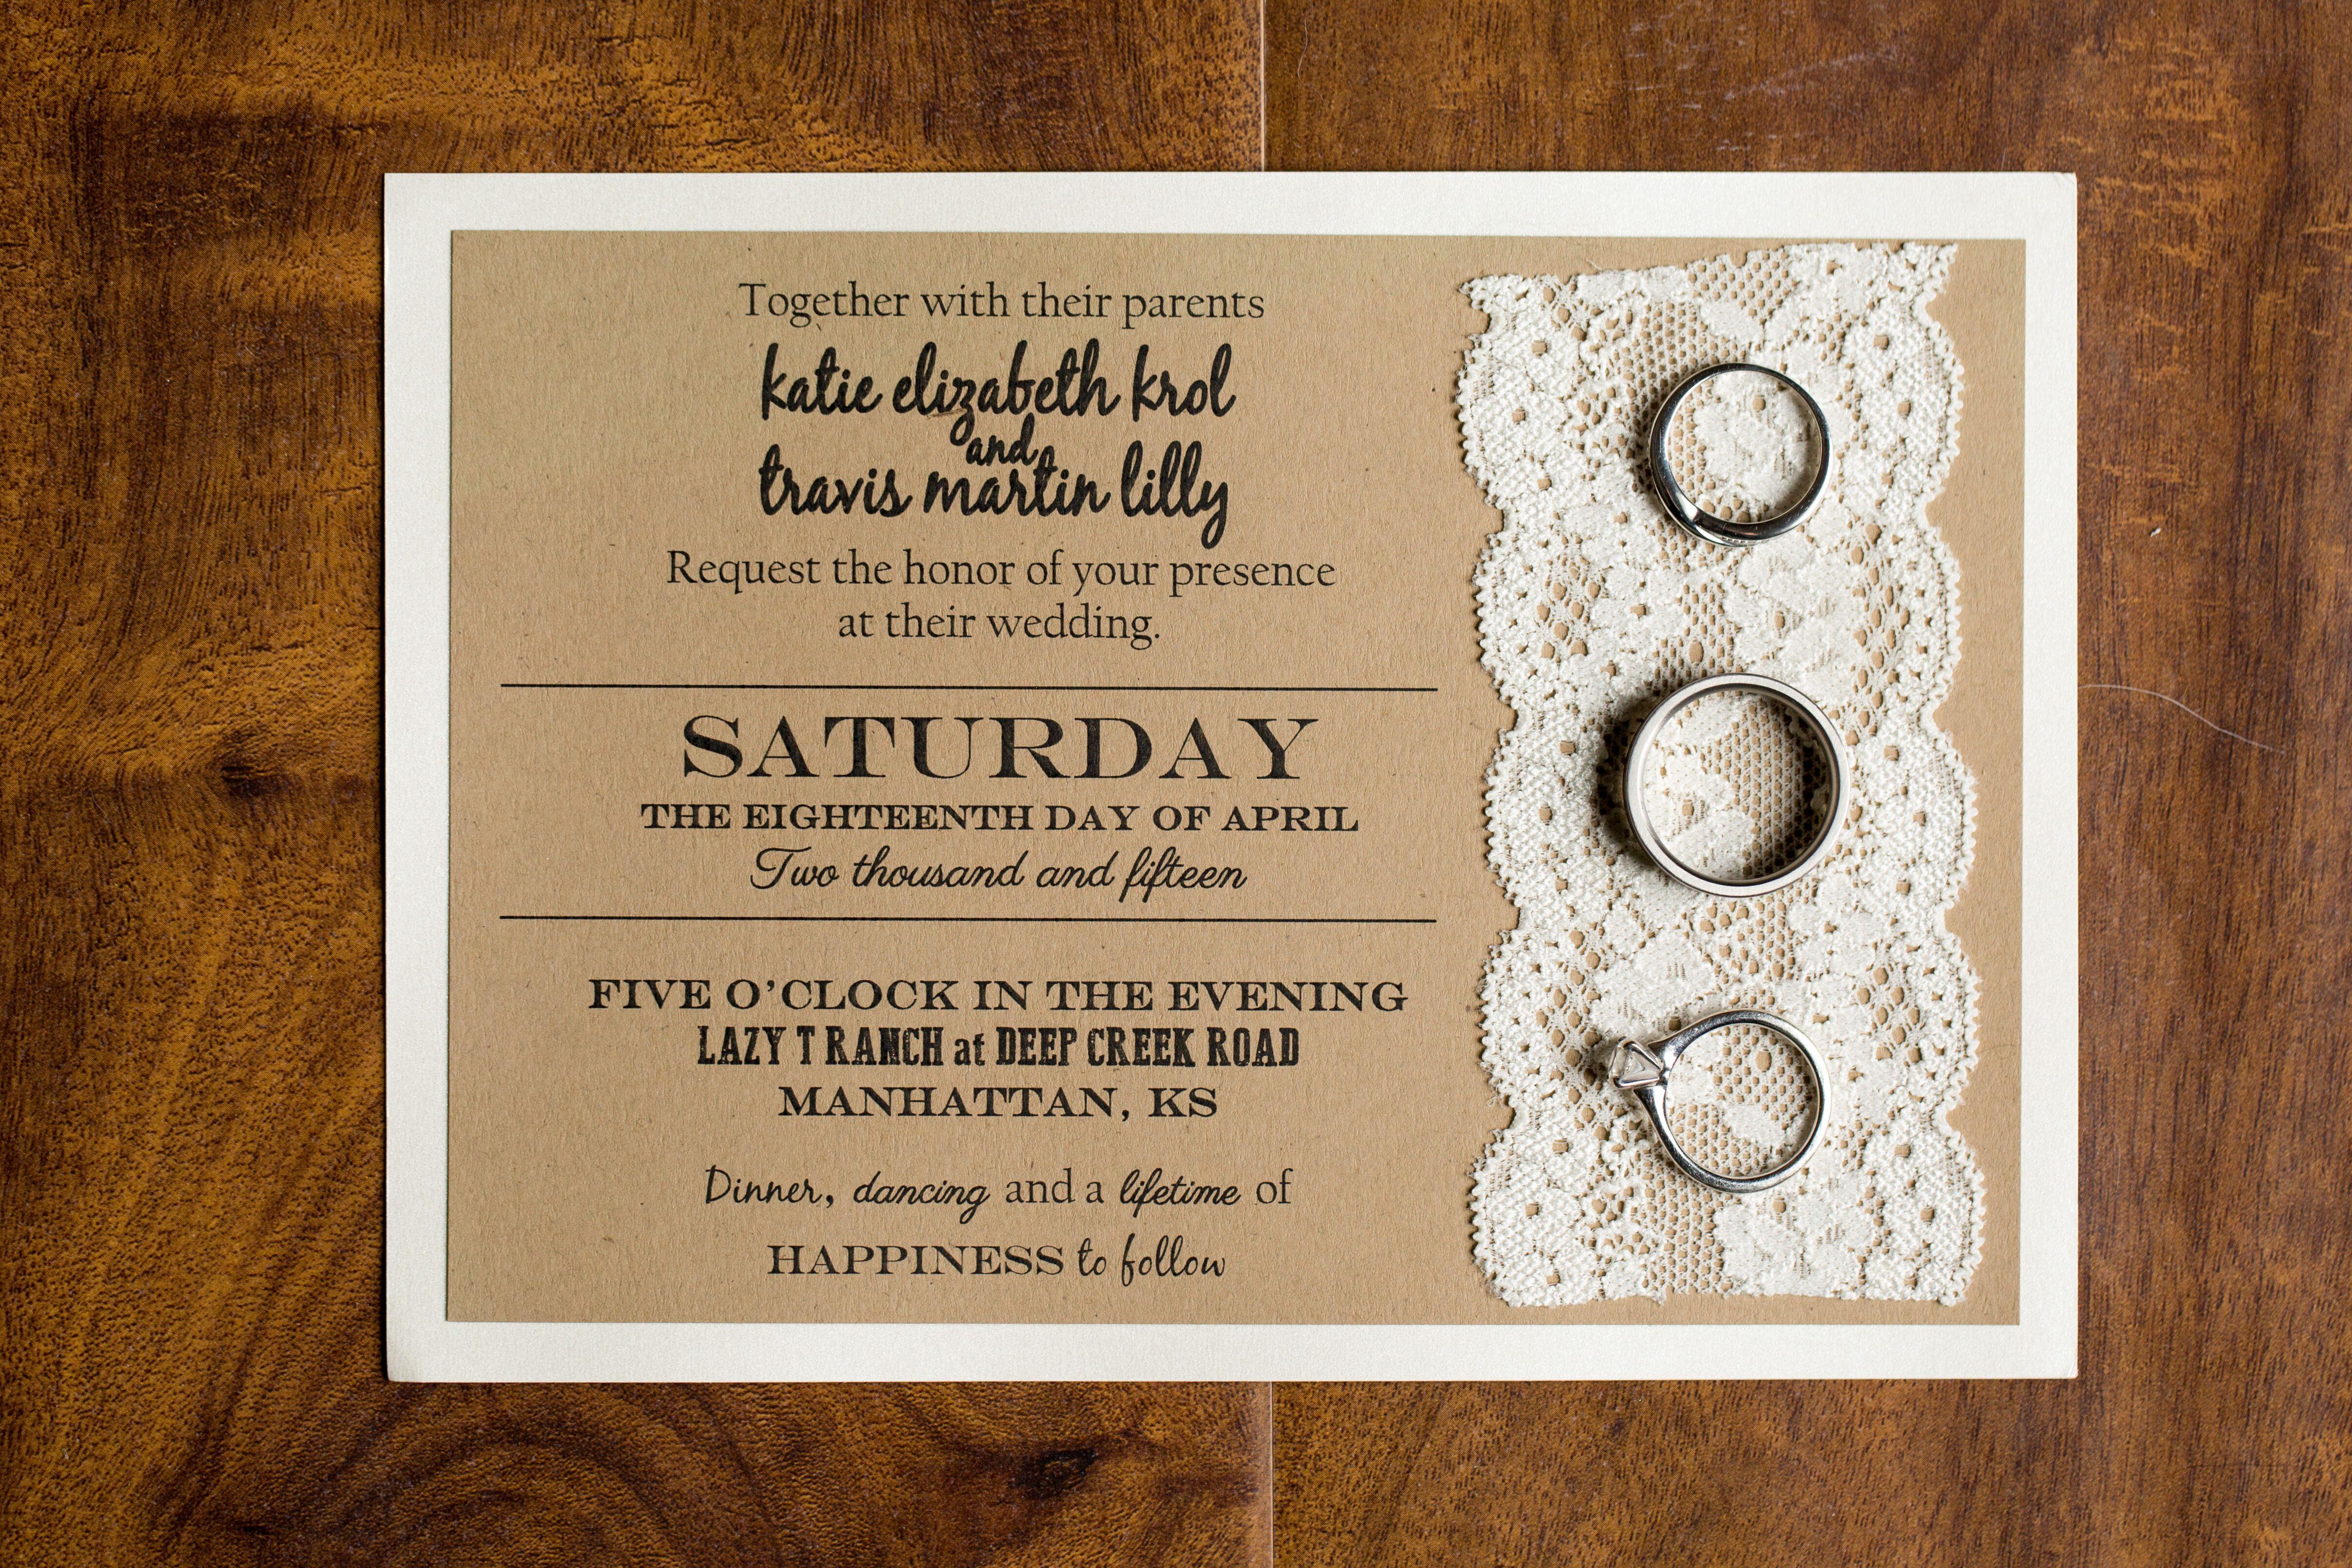 Diy Kraft Paper Wedding Invitations: DIY Laser-Printed Lace And Kraft Paper Invitations